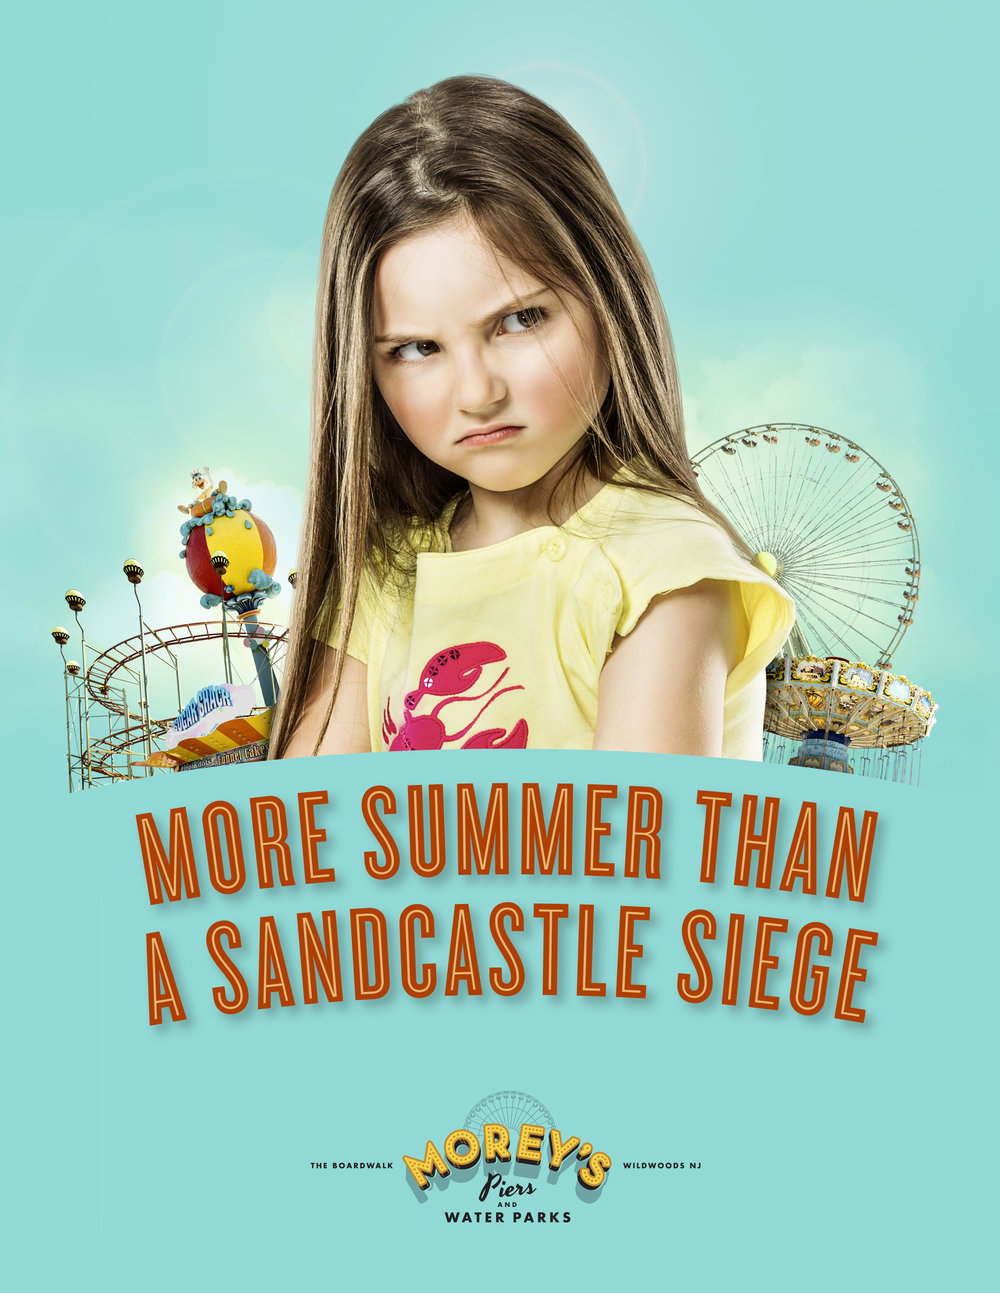 Moreys_summer17_print_sandcastle_R2.jpg